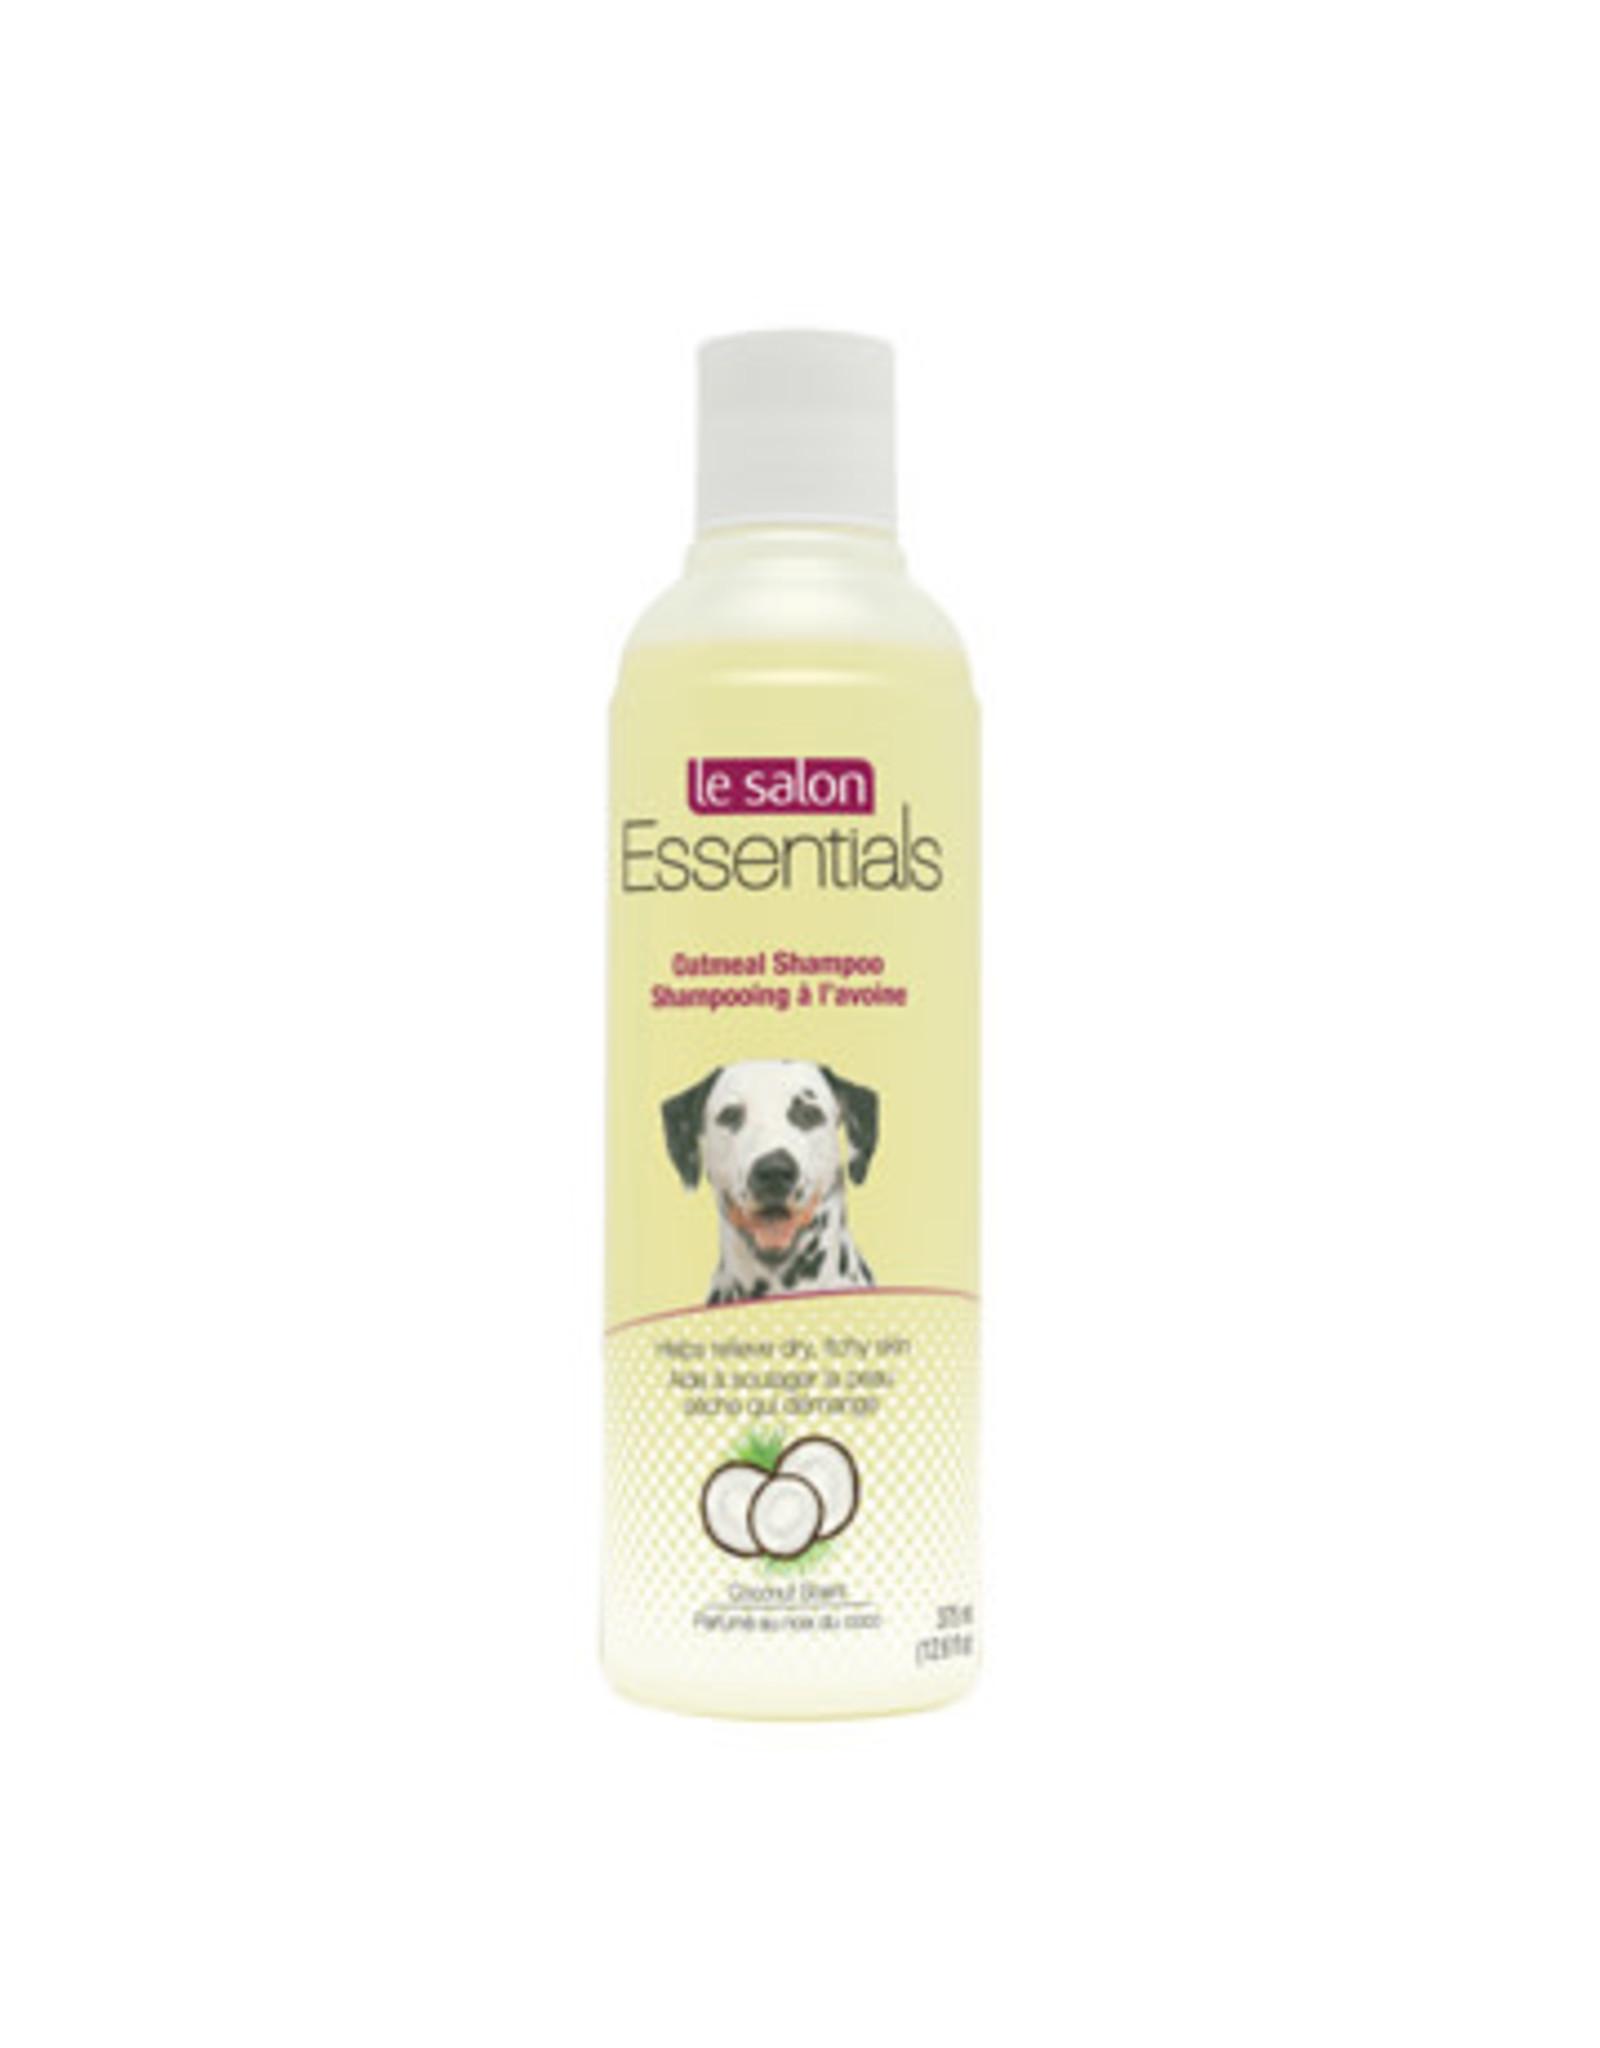 Le Salon LeSalon Essentials Oatmeal Shampoo - 375 mL (12.6 fl oz)